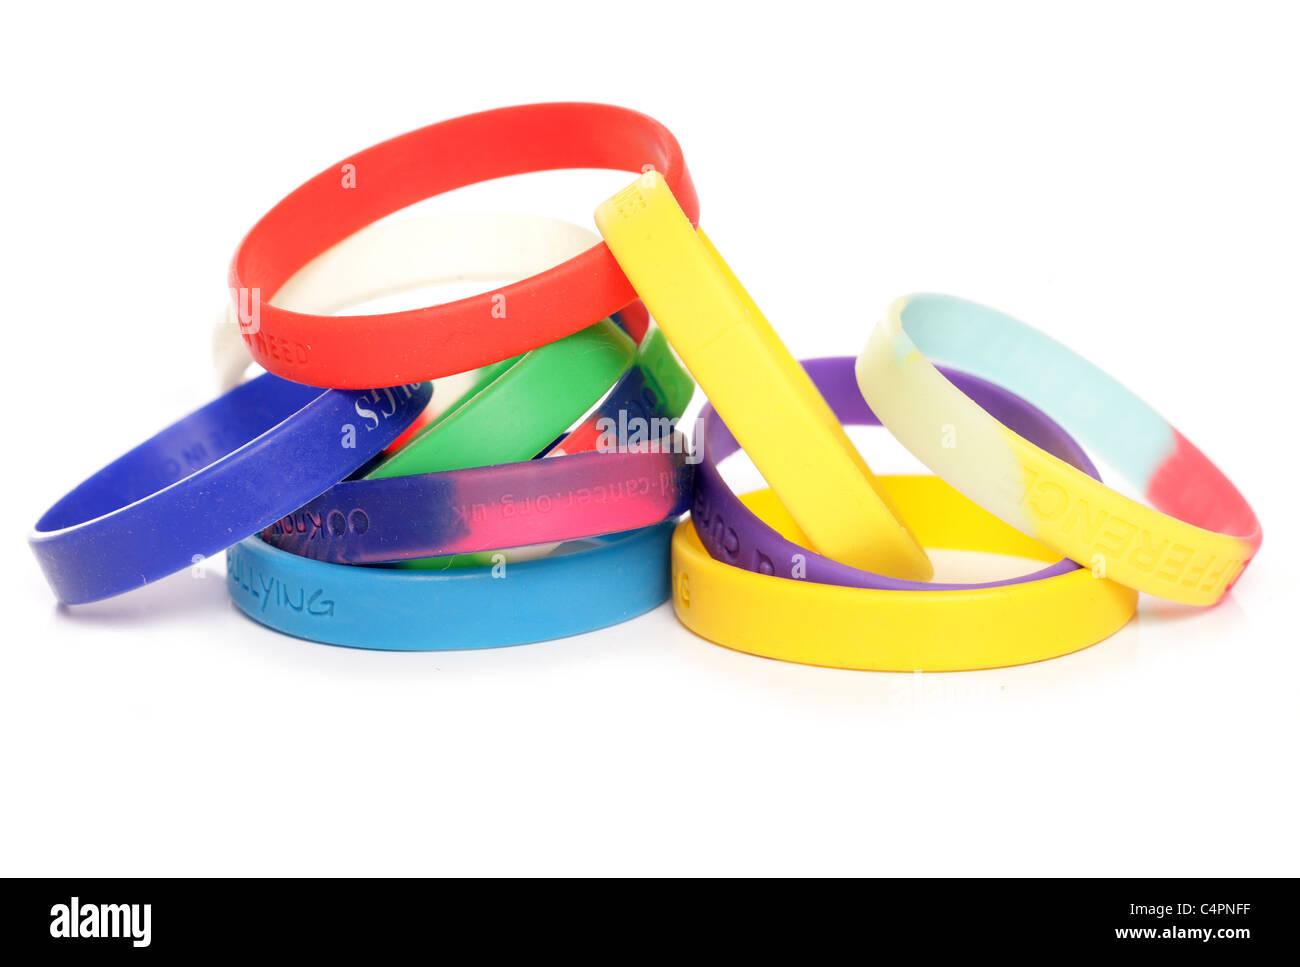 Various charity fundraising wristbands studio cutout - Stock Image